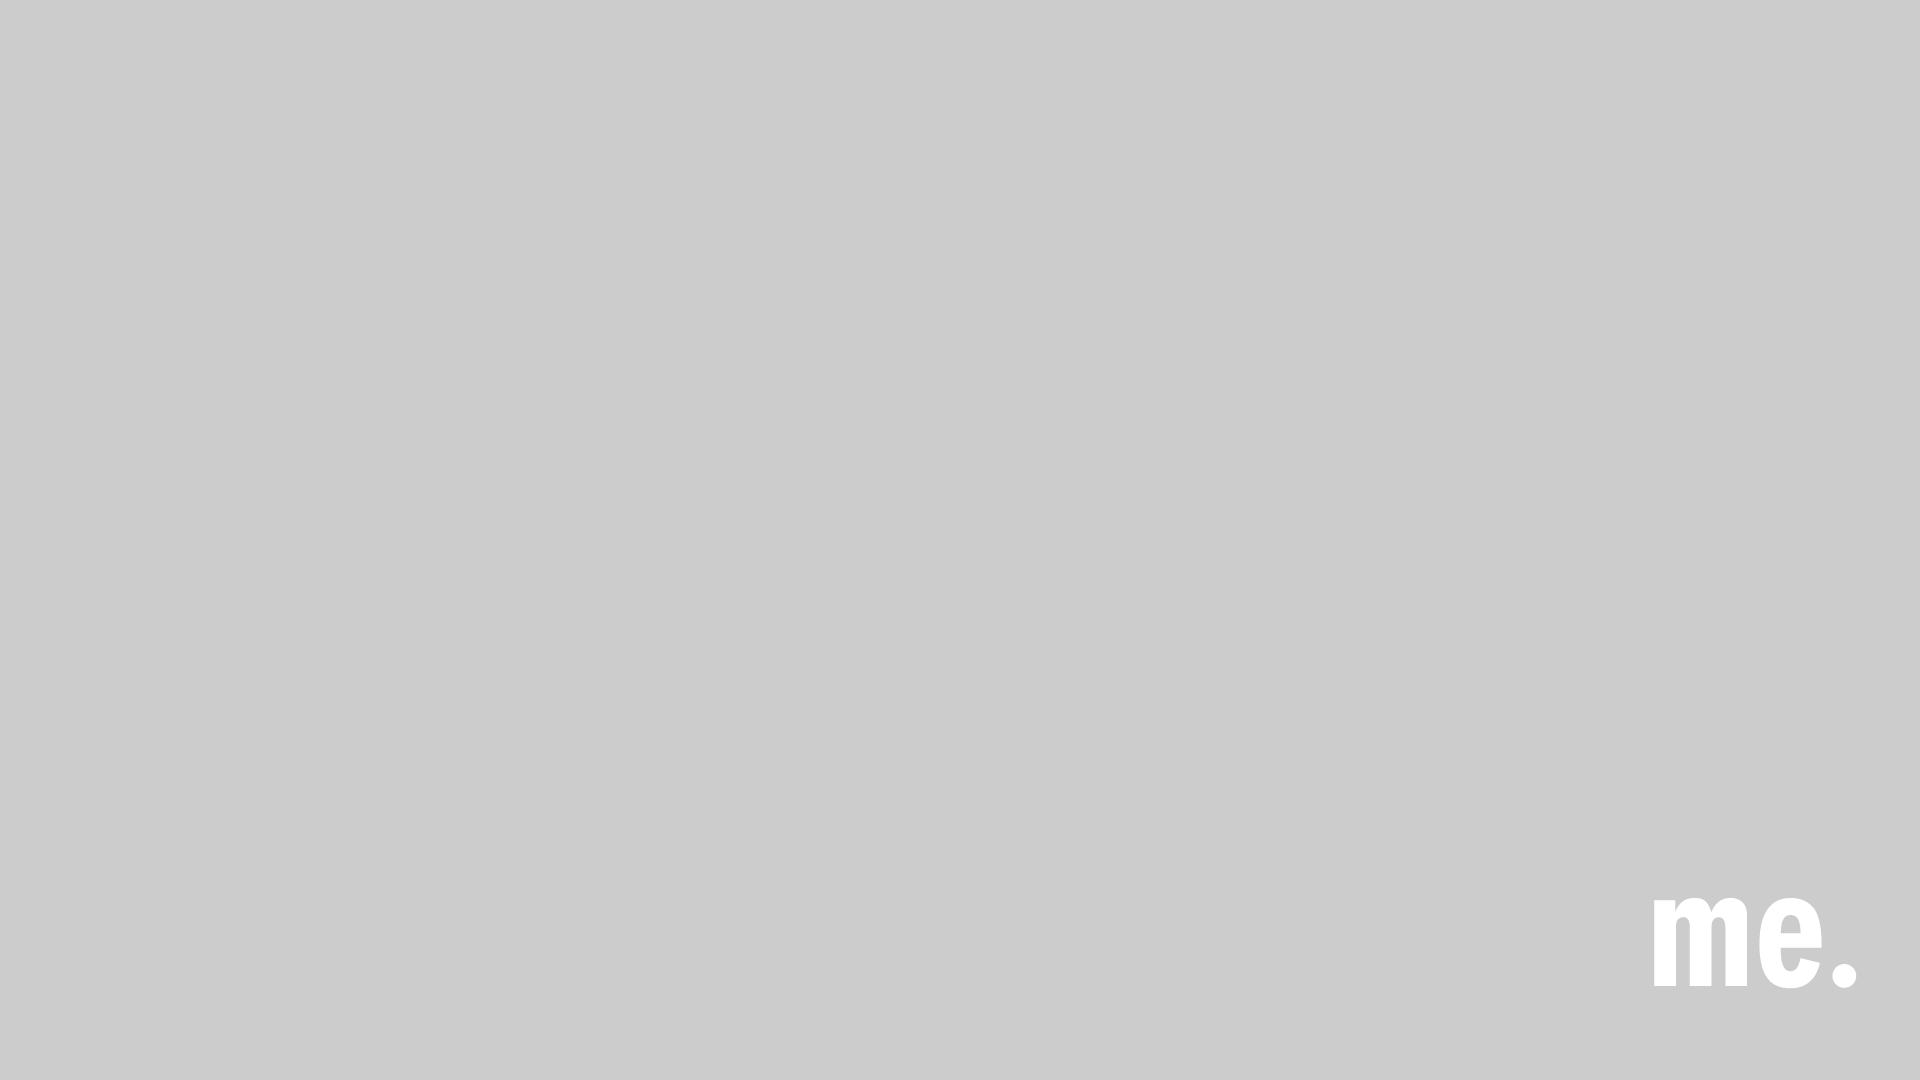 Cesc Fabregas' Tor für Spanien gegen Italien …